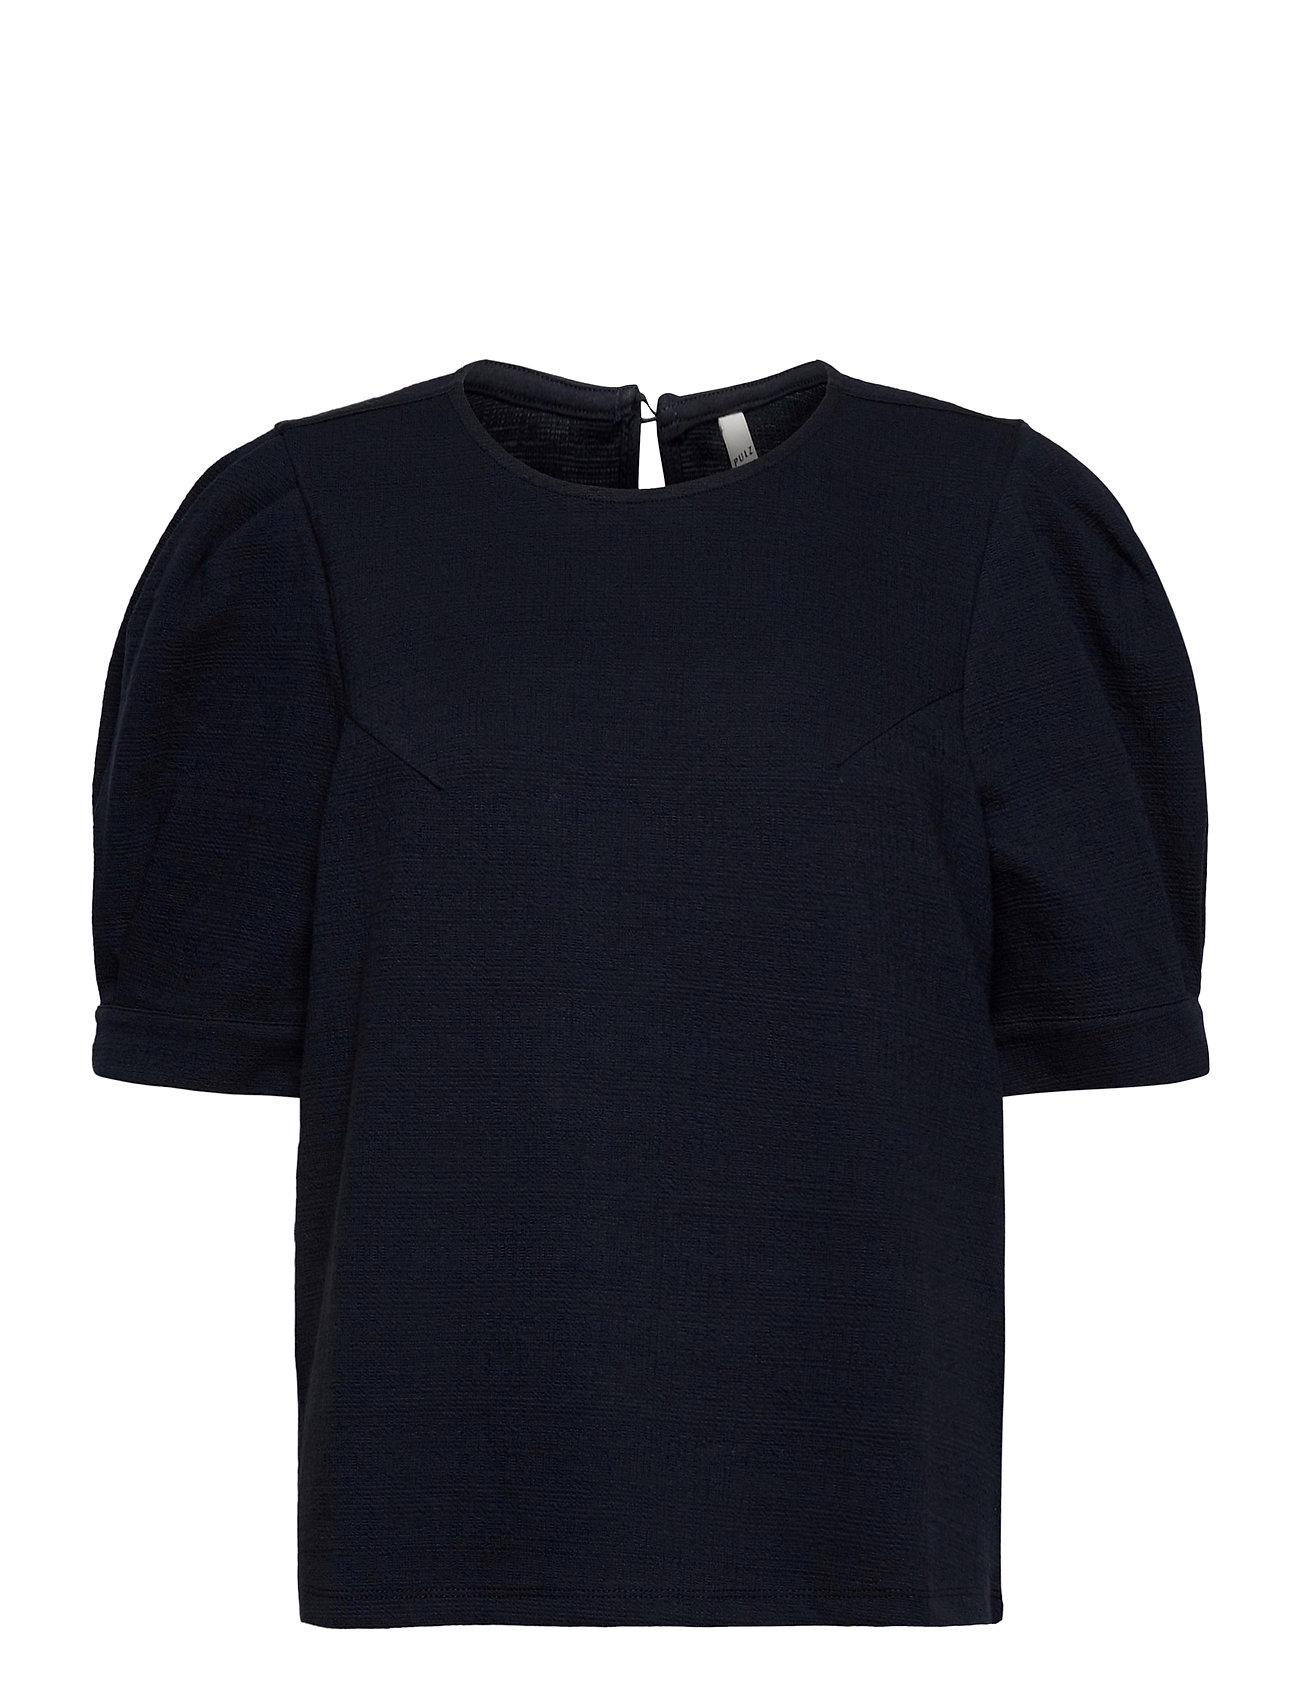 Image of Pzamra Blouse Blouses Short-sleeved Blå Pulz Jeans (3436649781)